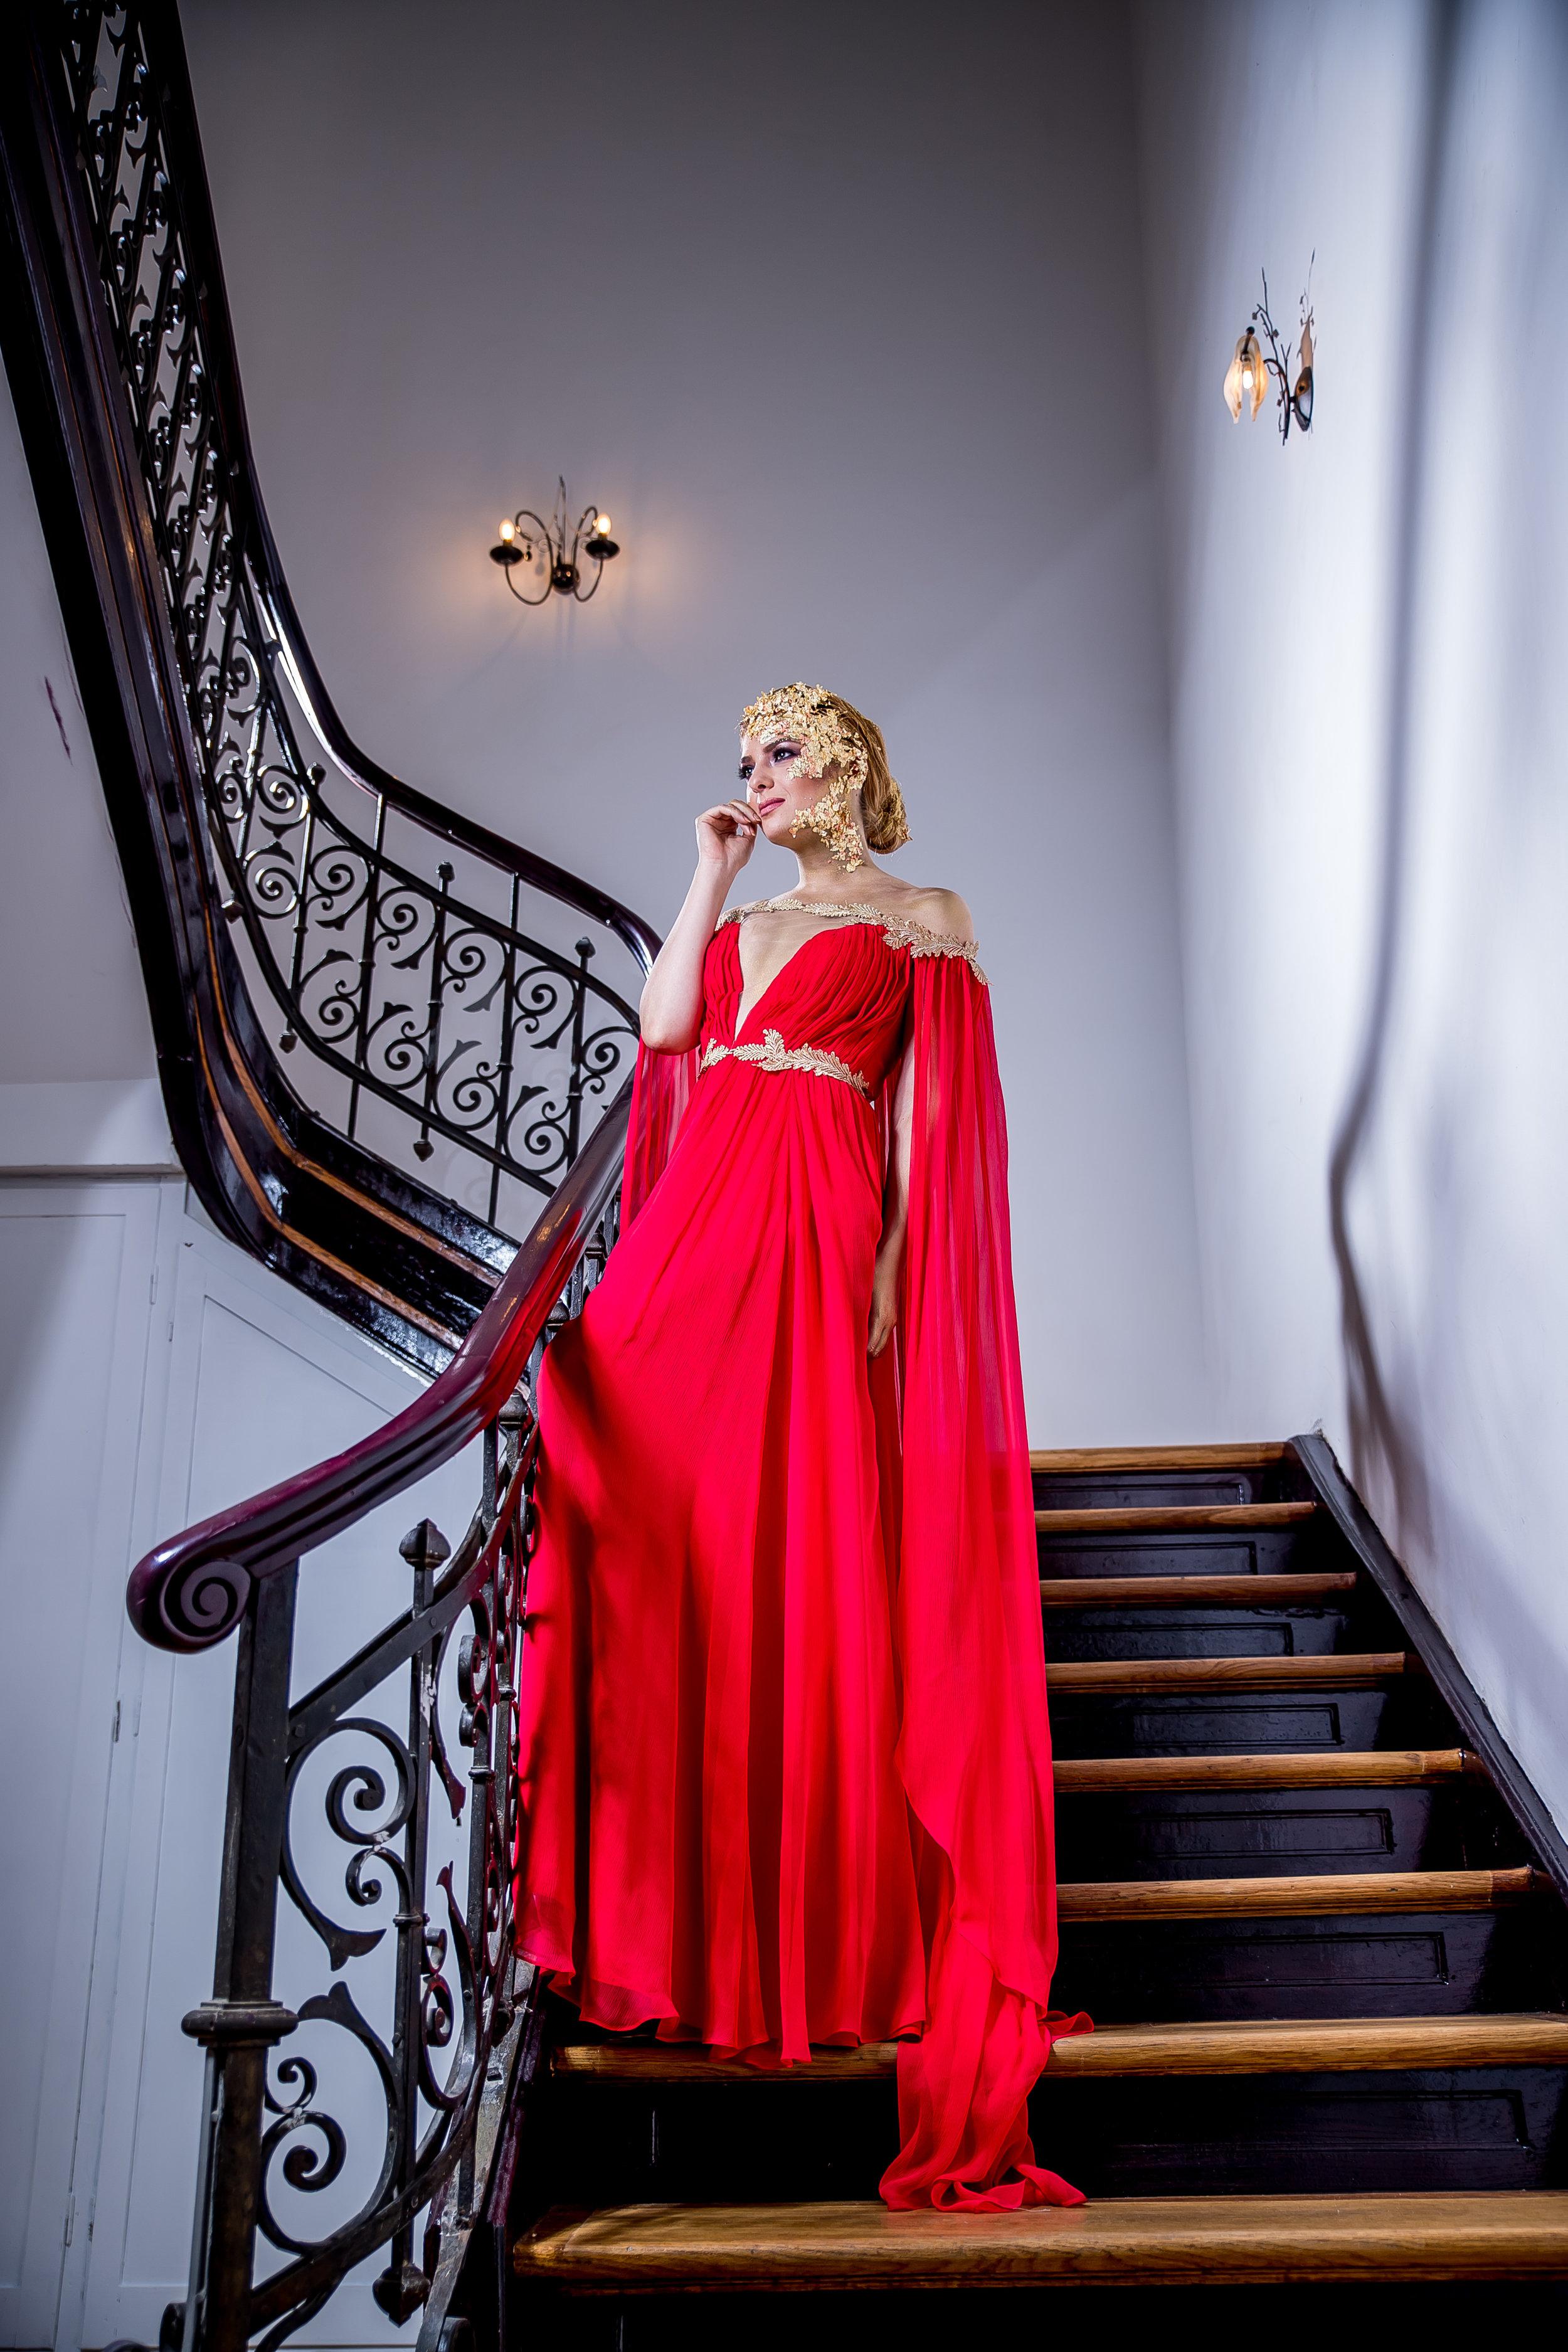 evening dresses Fashion By Laina - Style 18 AINI TAF008(6).jpg